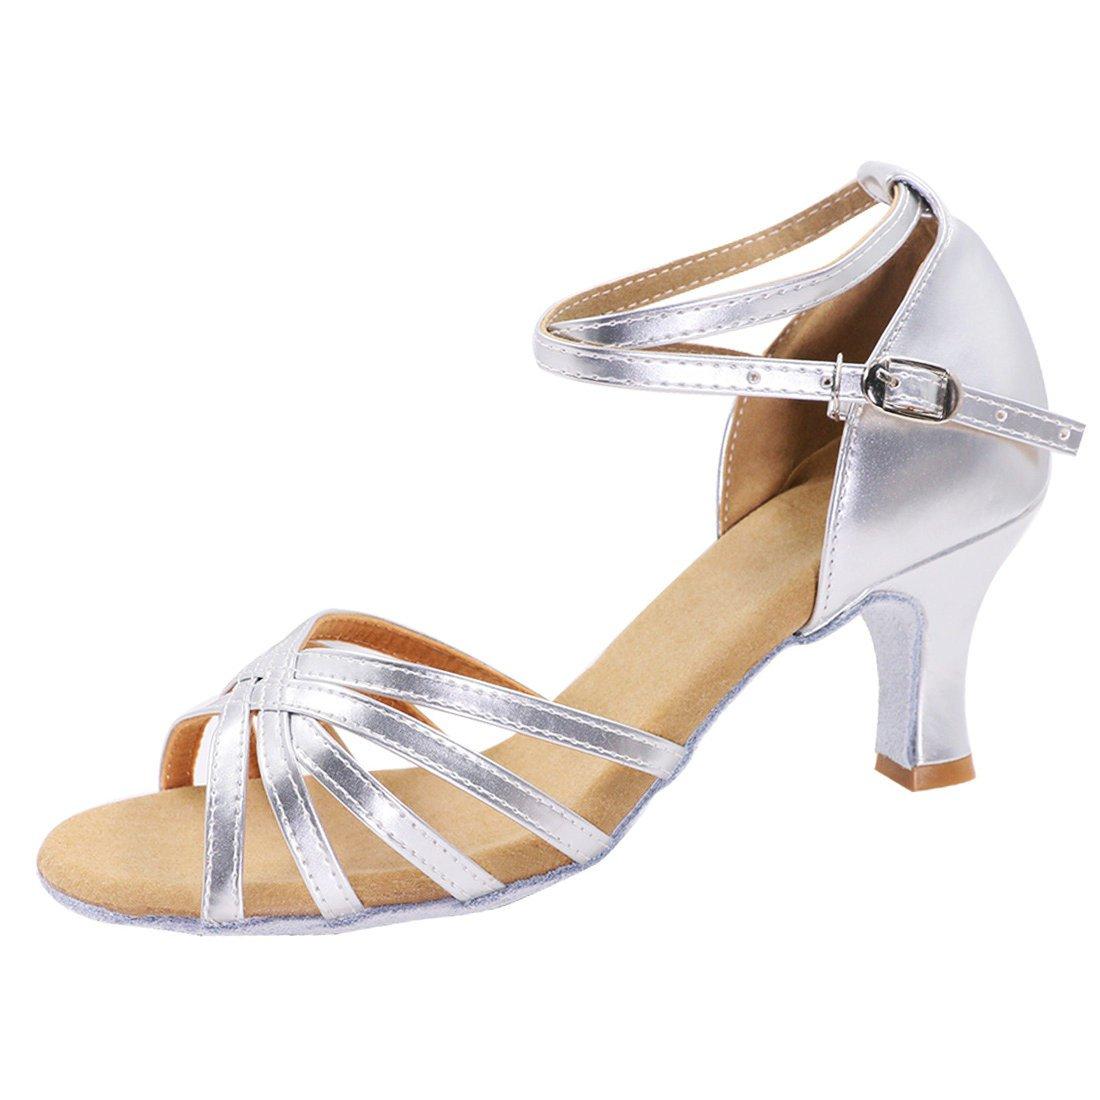 GetMine Women's Professional Latin Dance Shoes Satin Salsa Ballroom Wedding Dancing Shoes 2.4'' Heel Silver